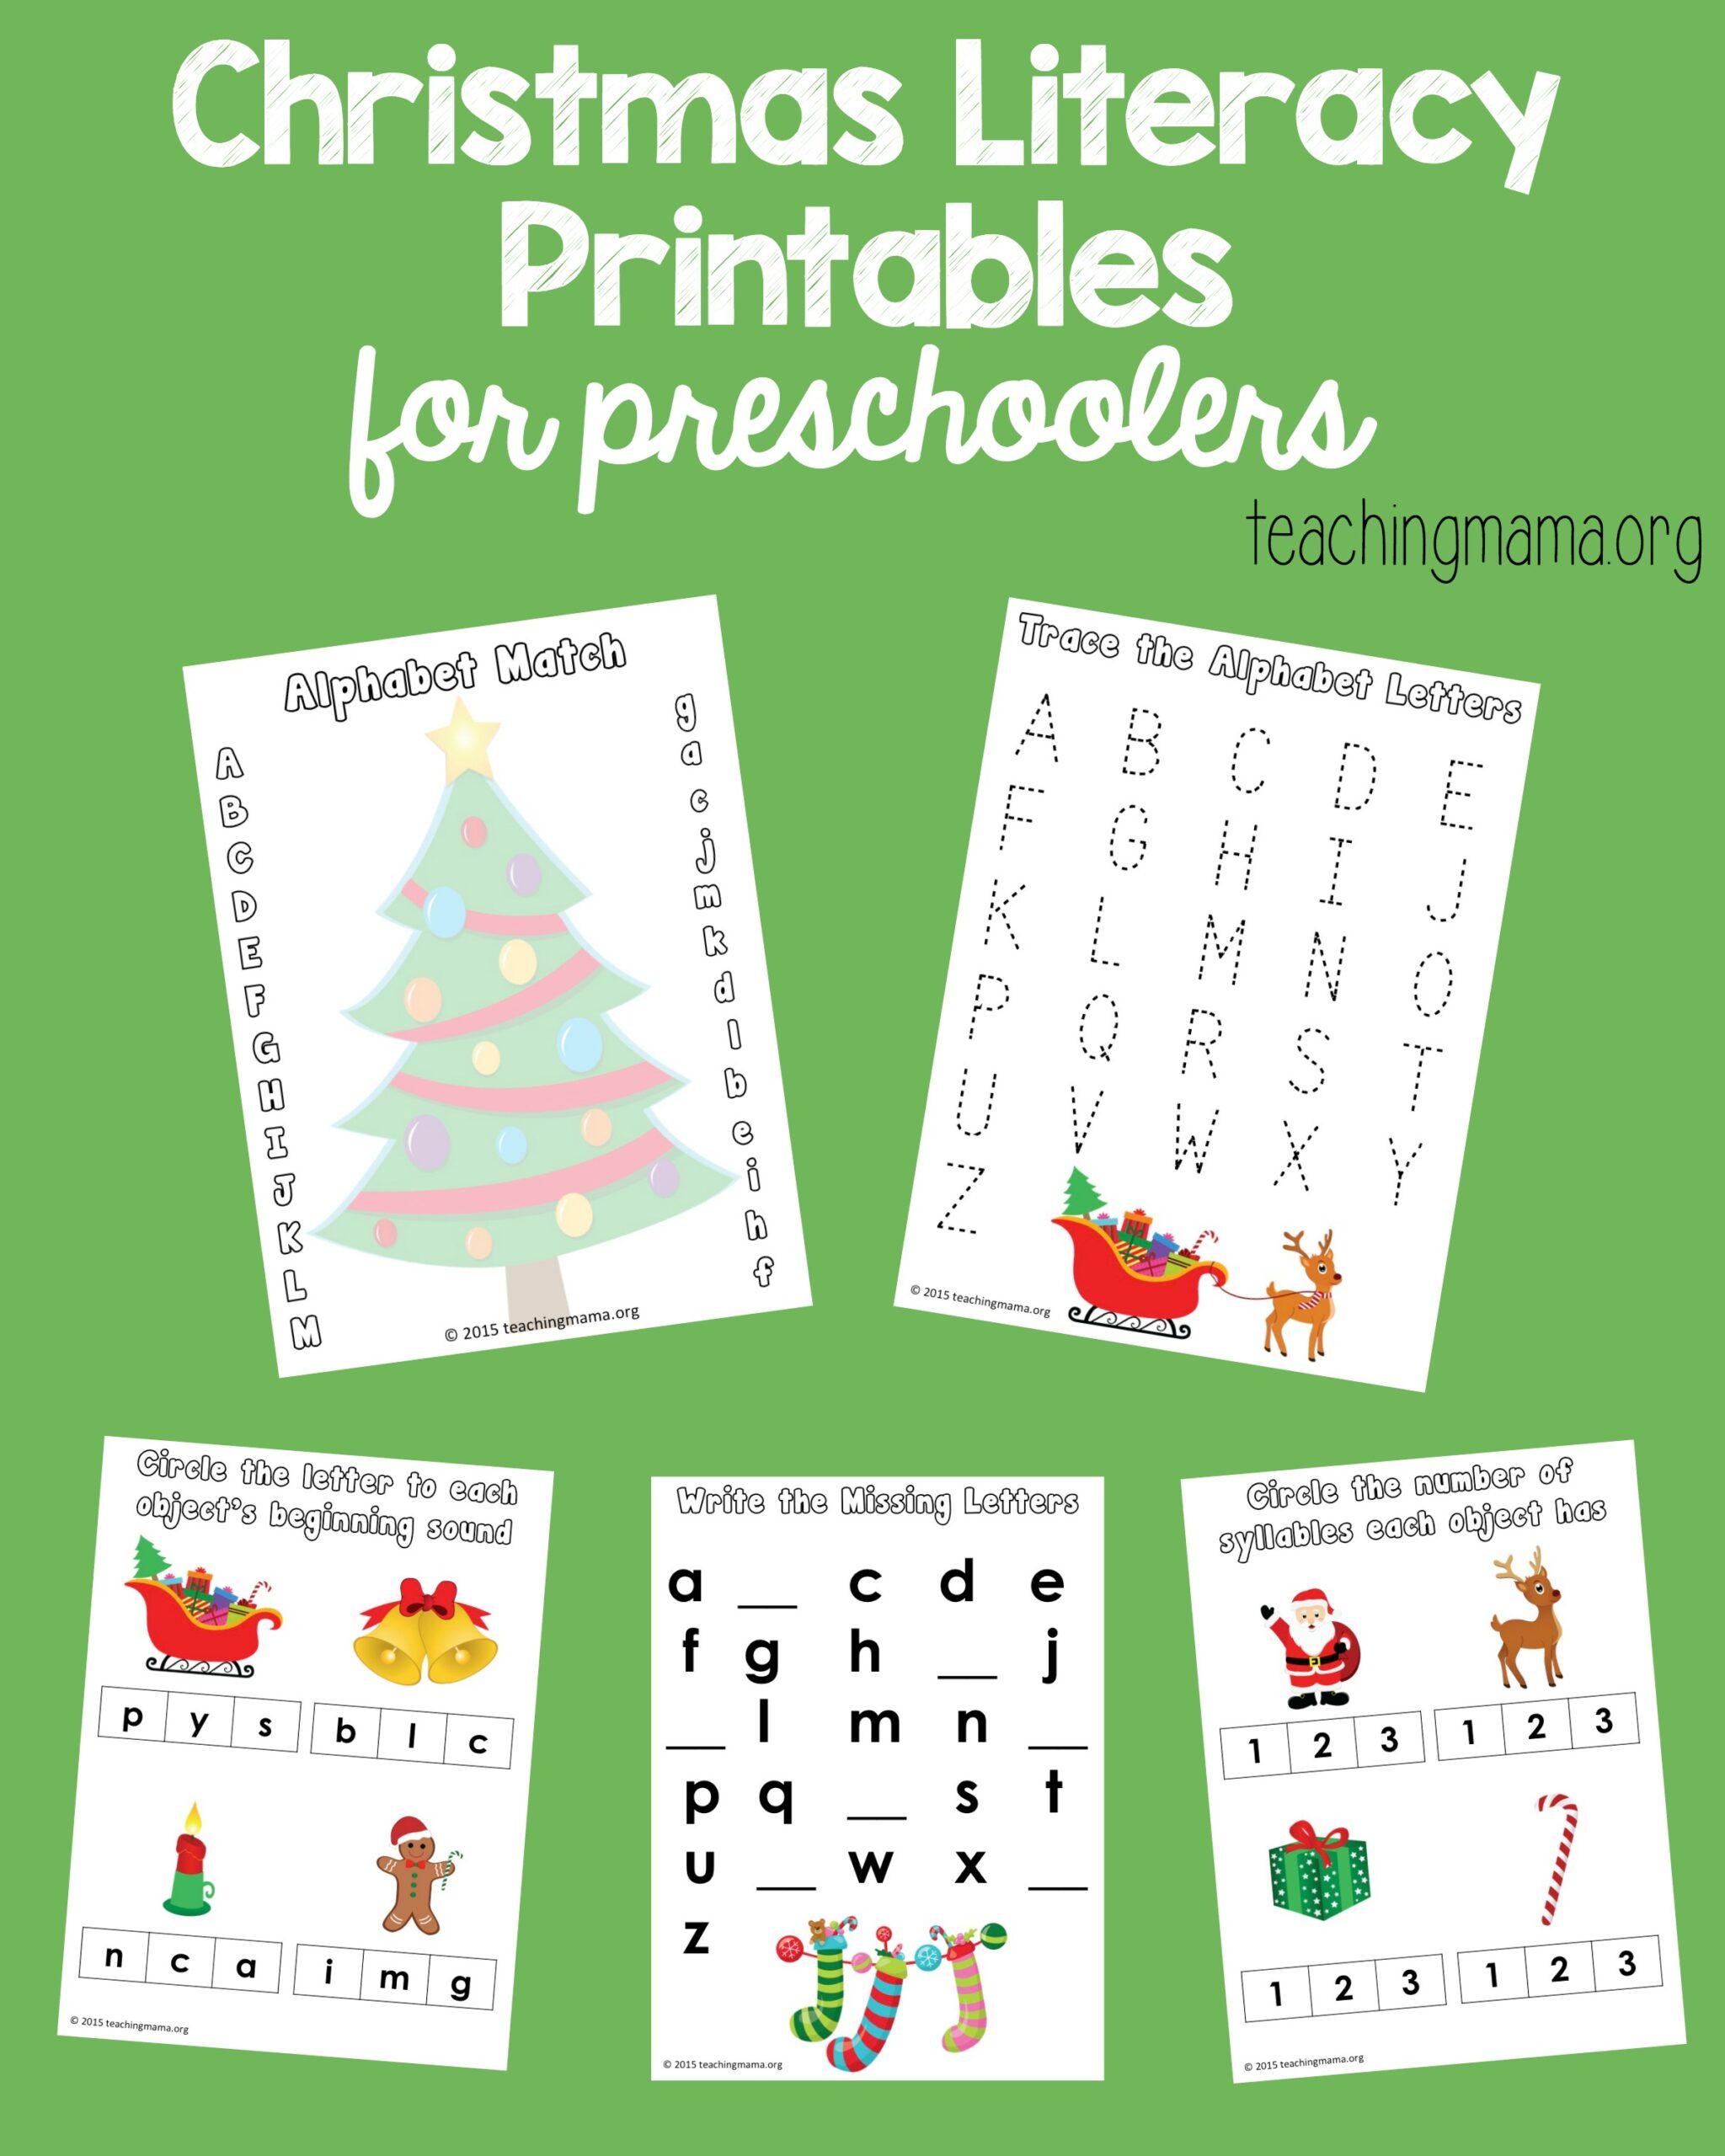 Christmas Literacy Printables For Preschoolers